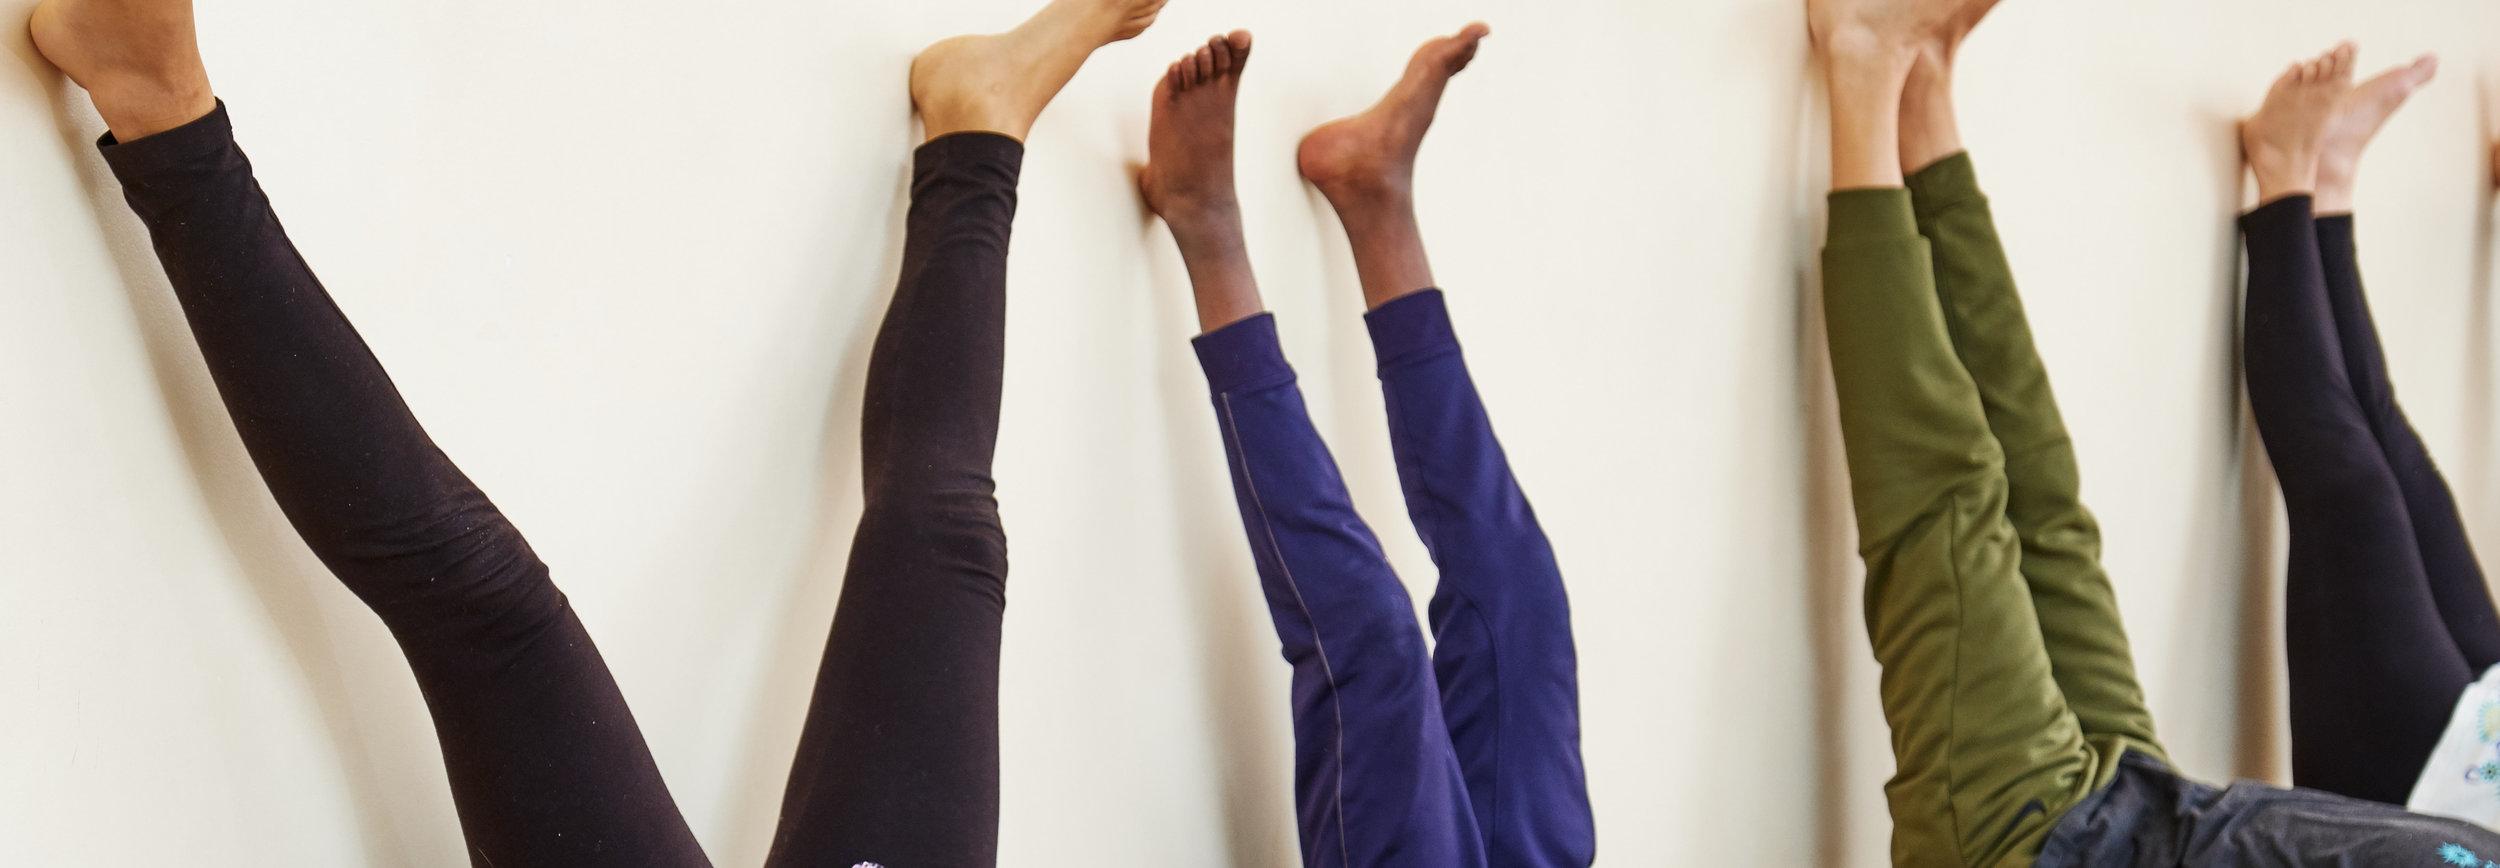 Wall Legs Lg.jpeg